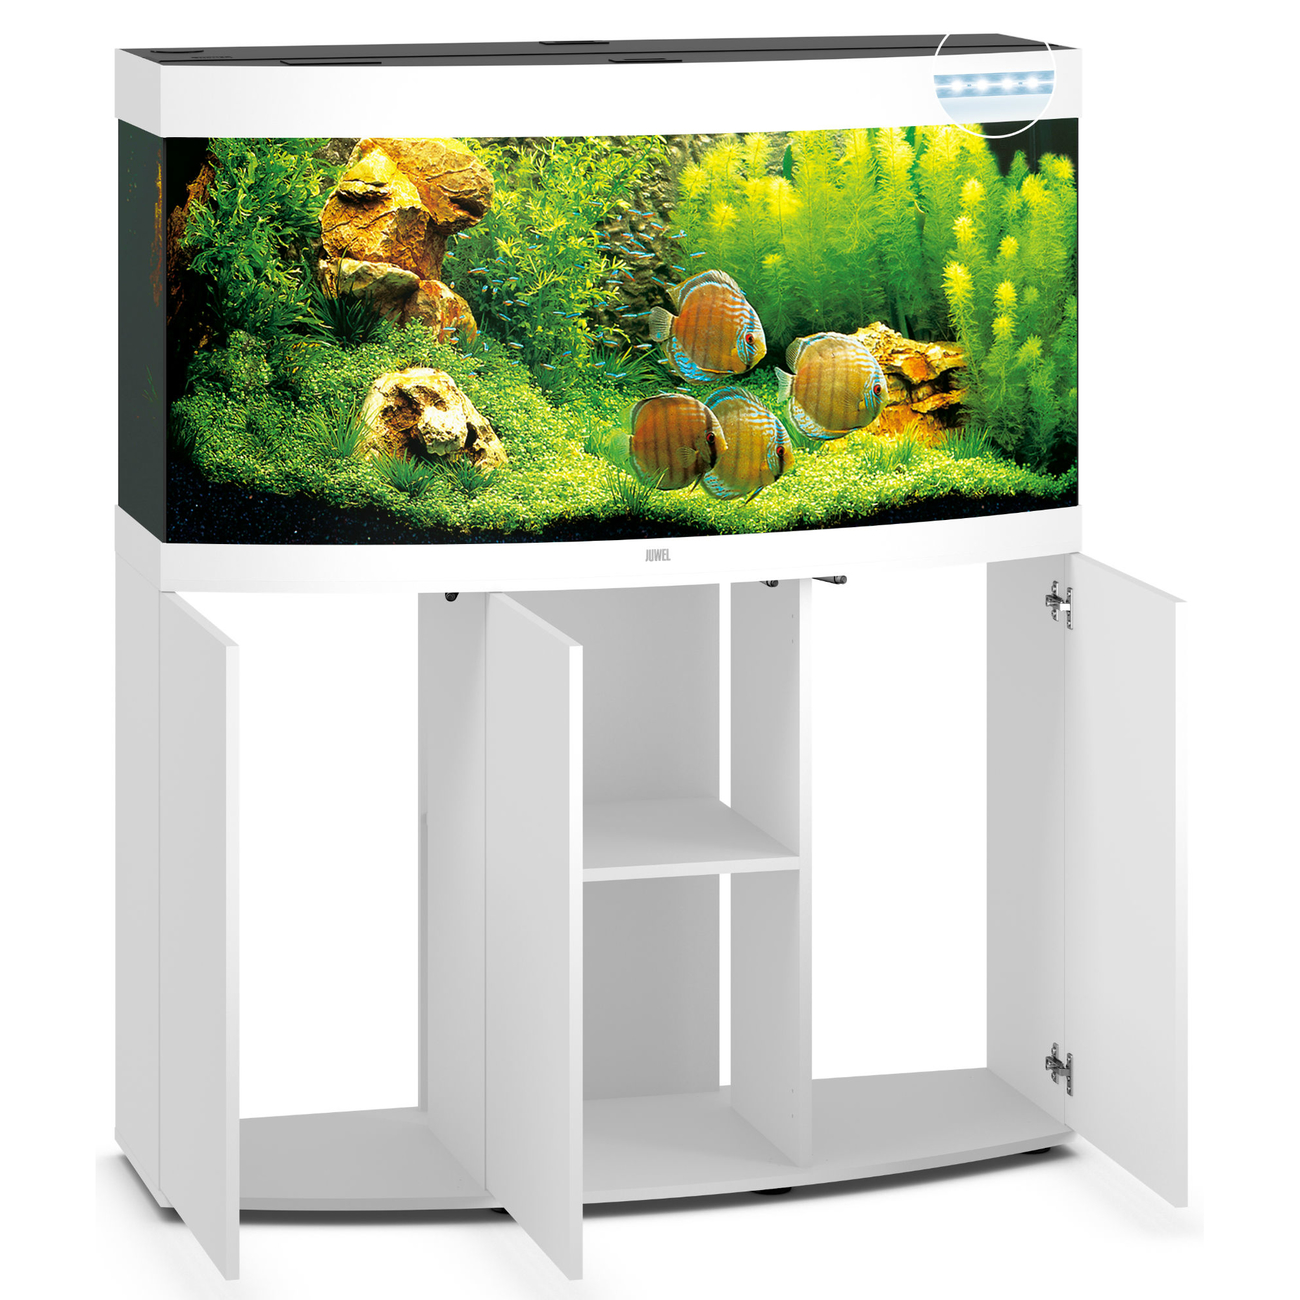 Juwel Vision 260 LED Aquarium mit Unterschrank SBX, Bild 9